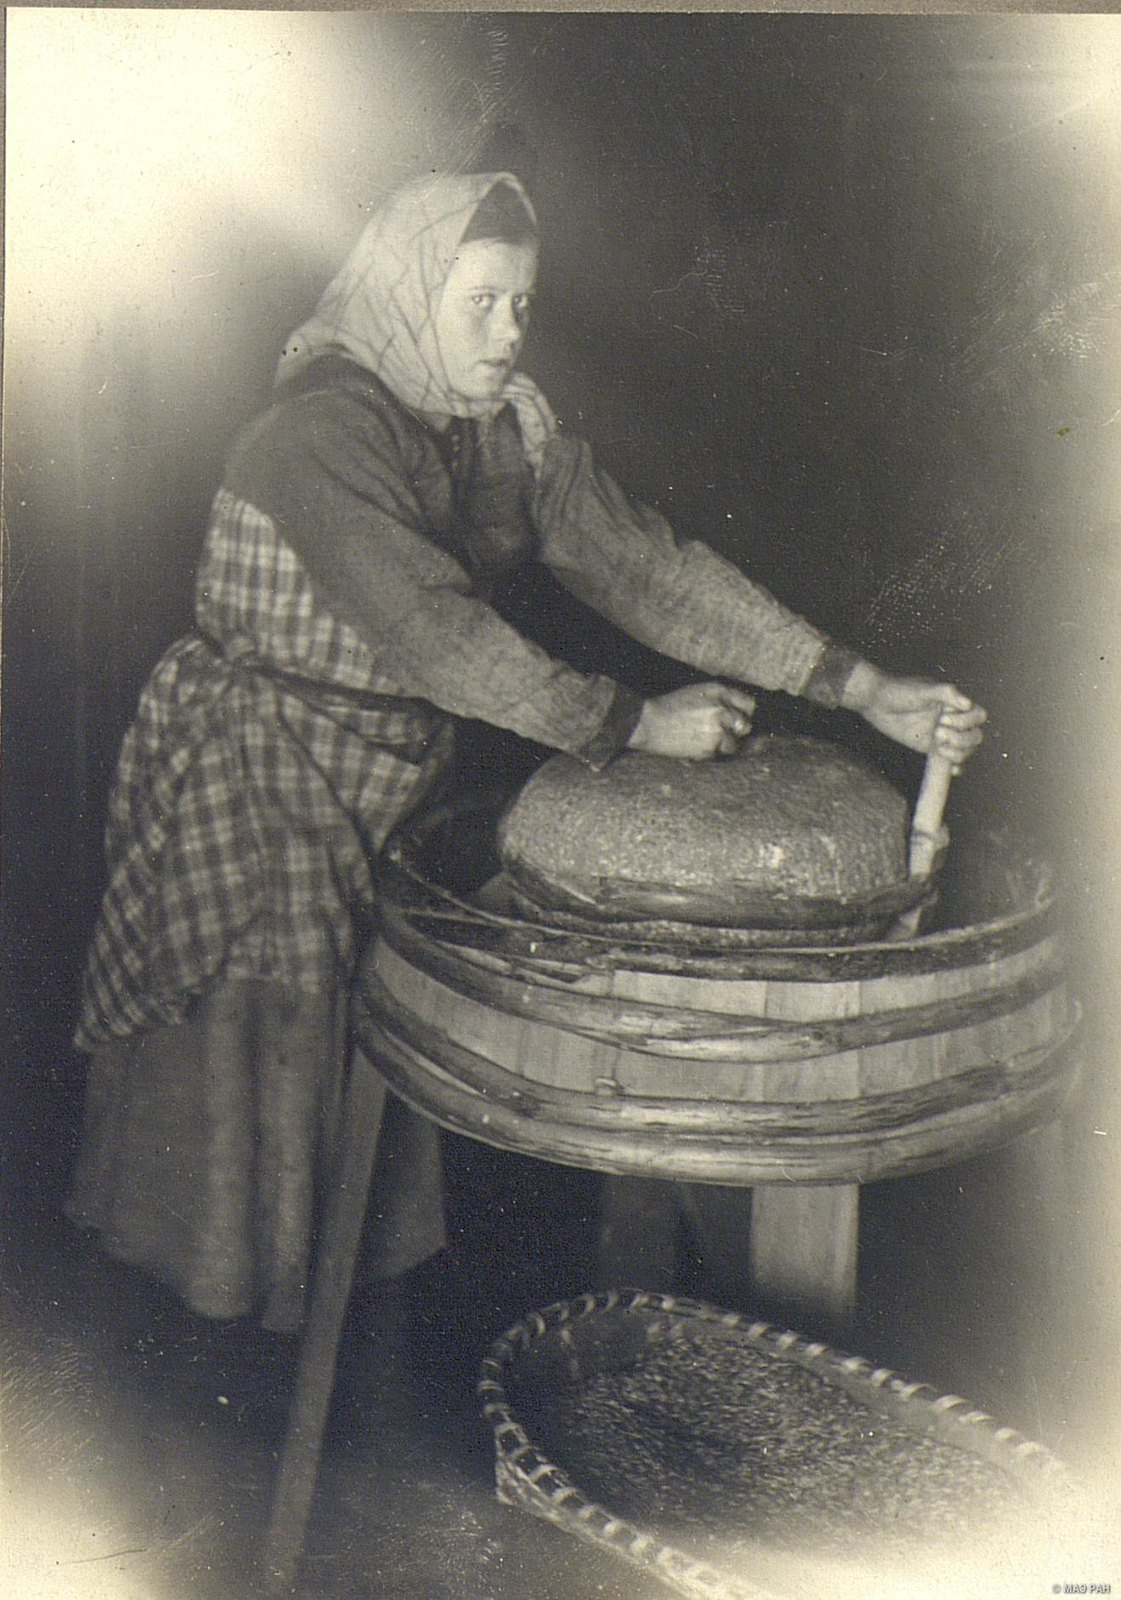 1903-1904. Архангельский край на снимках Николая Авенировича Шабунина. Часть 2